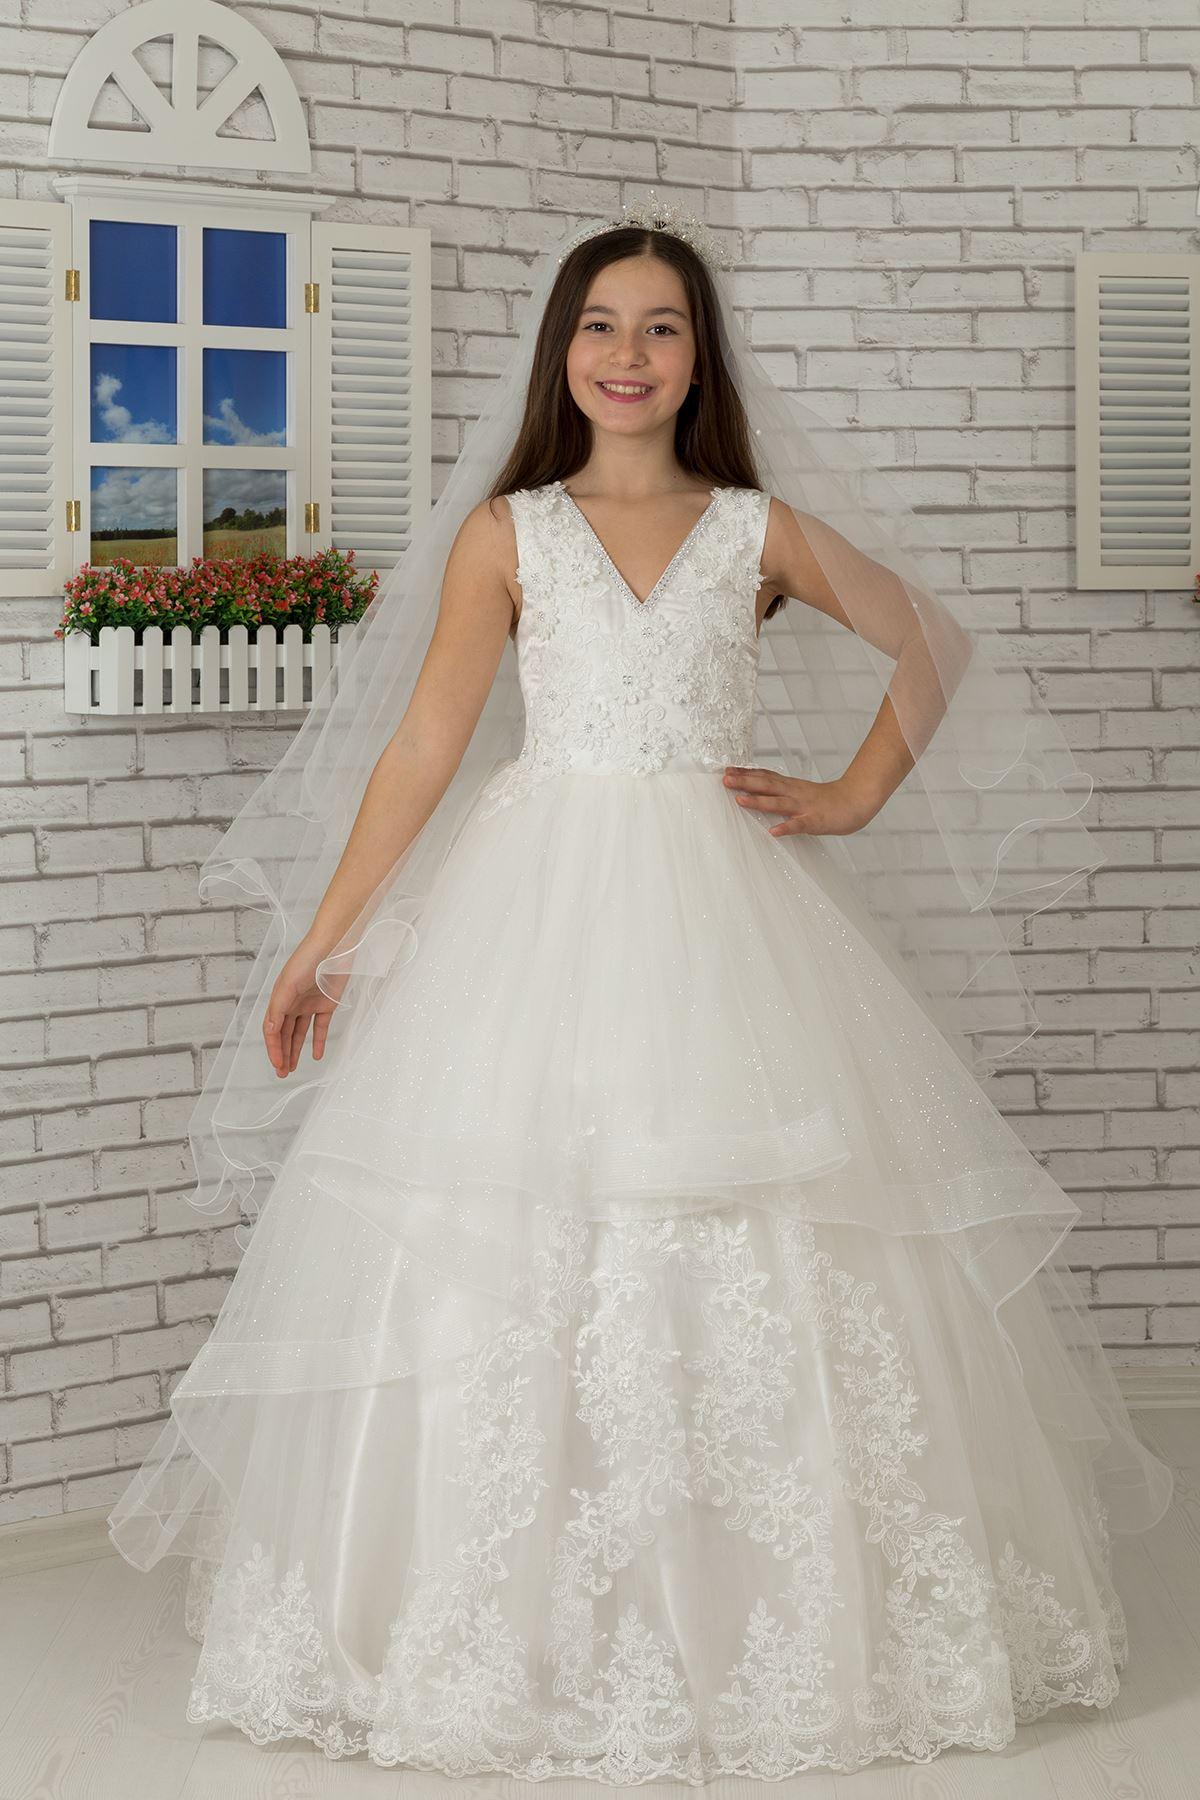 Embroidered appliqué, v-neck, tulle Fluffy Girl's Evening Dress 606 Cream